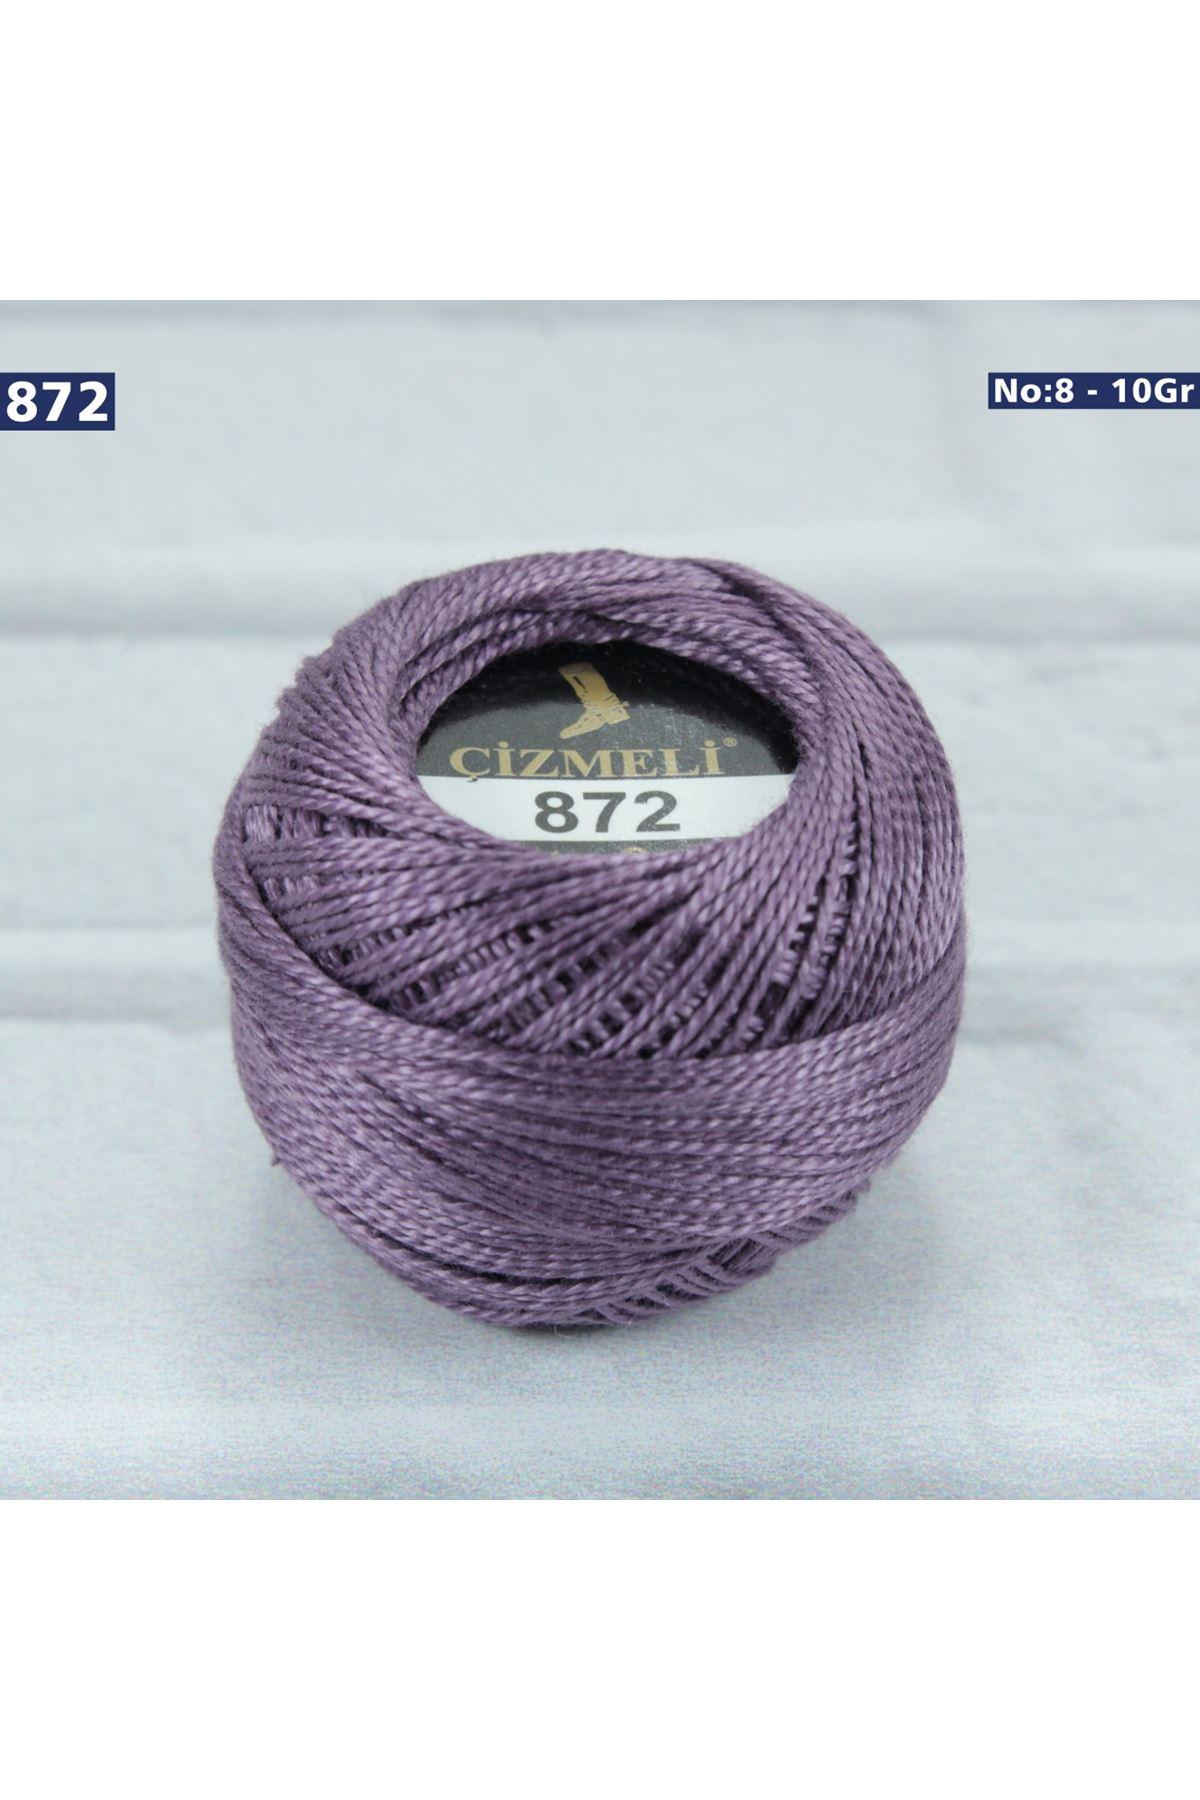 Çizmeli Cotton Perle Nakış İpliği No: 872